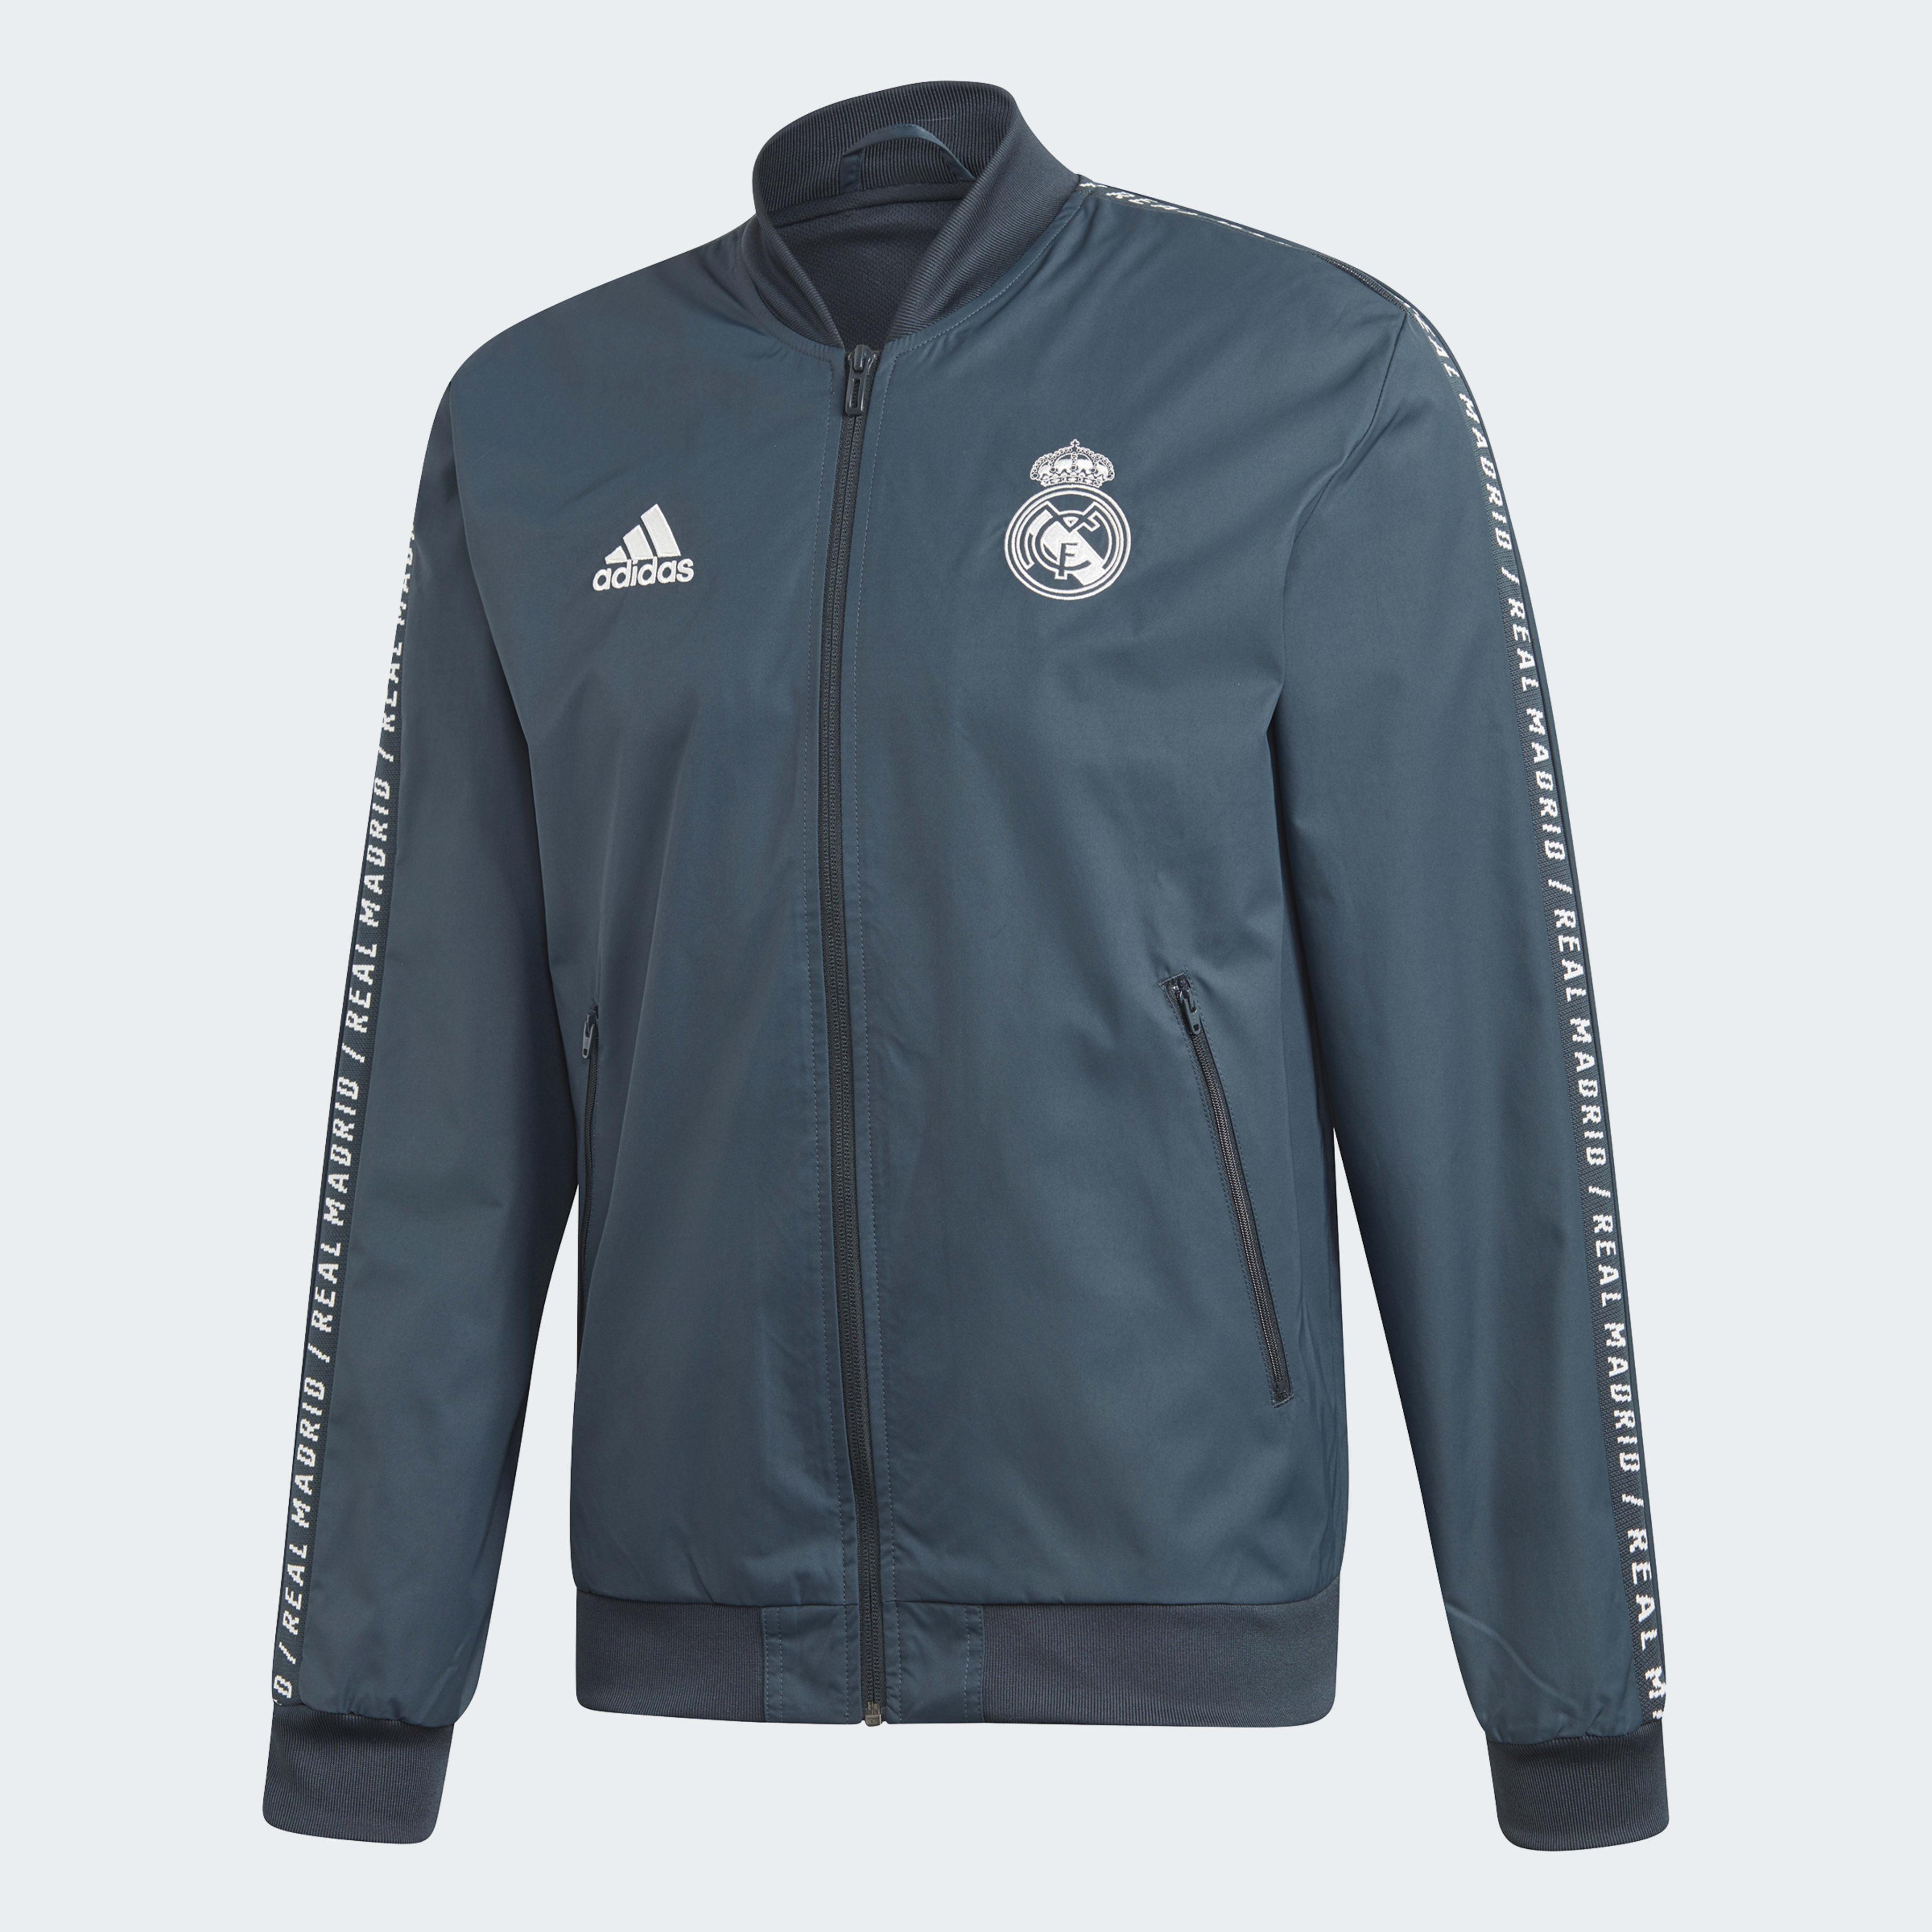 Samtjacke Adidas Originals